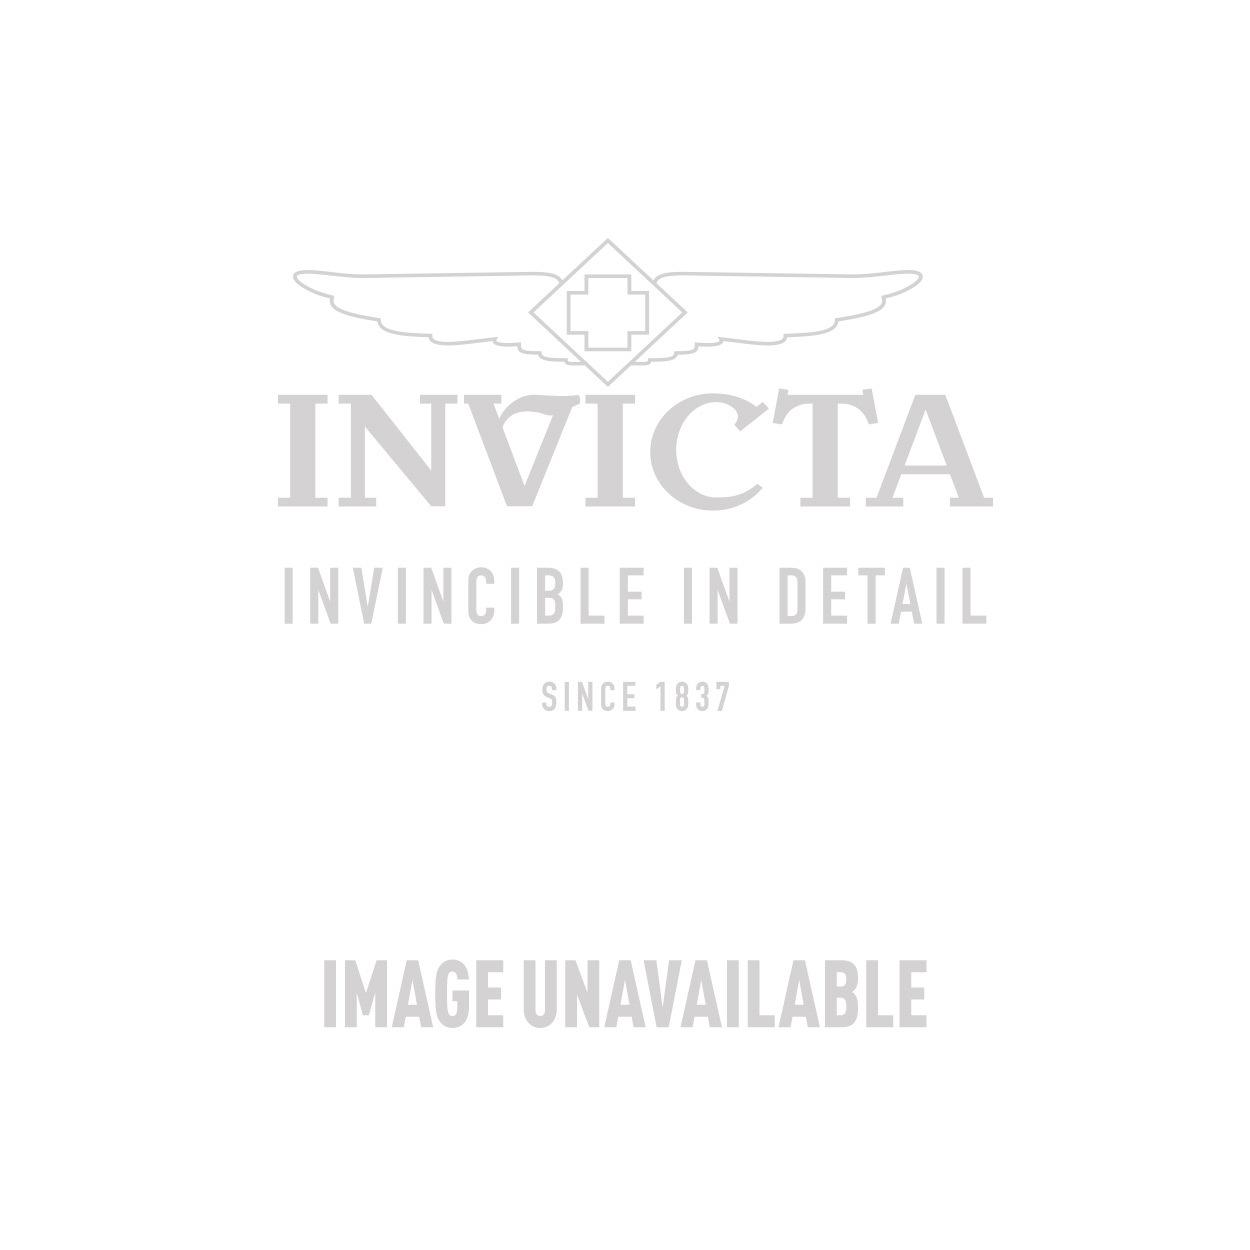 Invicta Corduba Quartz Watch - Gunmetal case with Grey tone Leather band - Model 18992